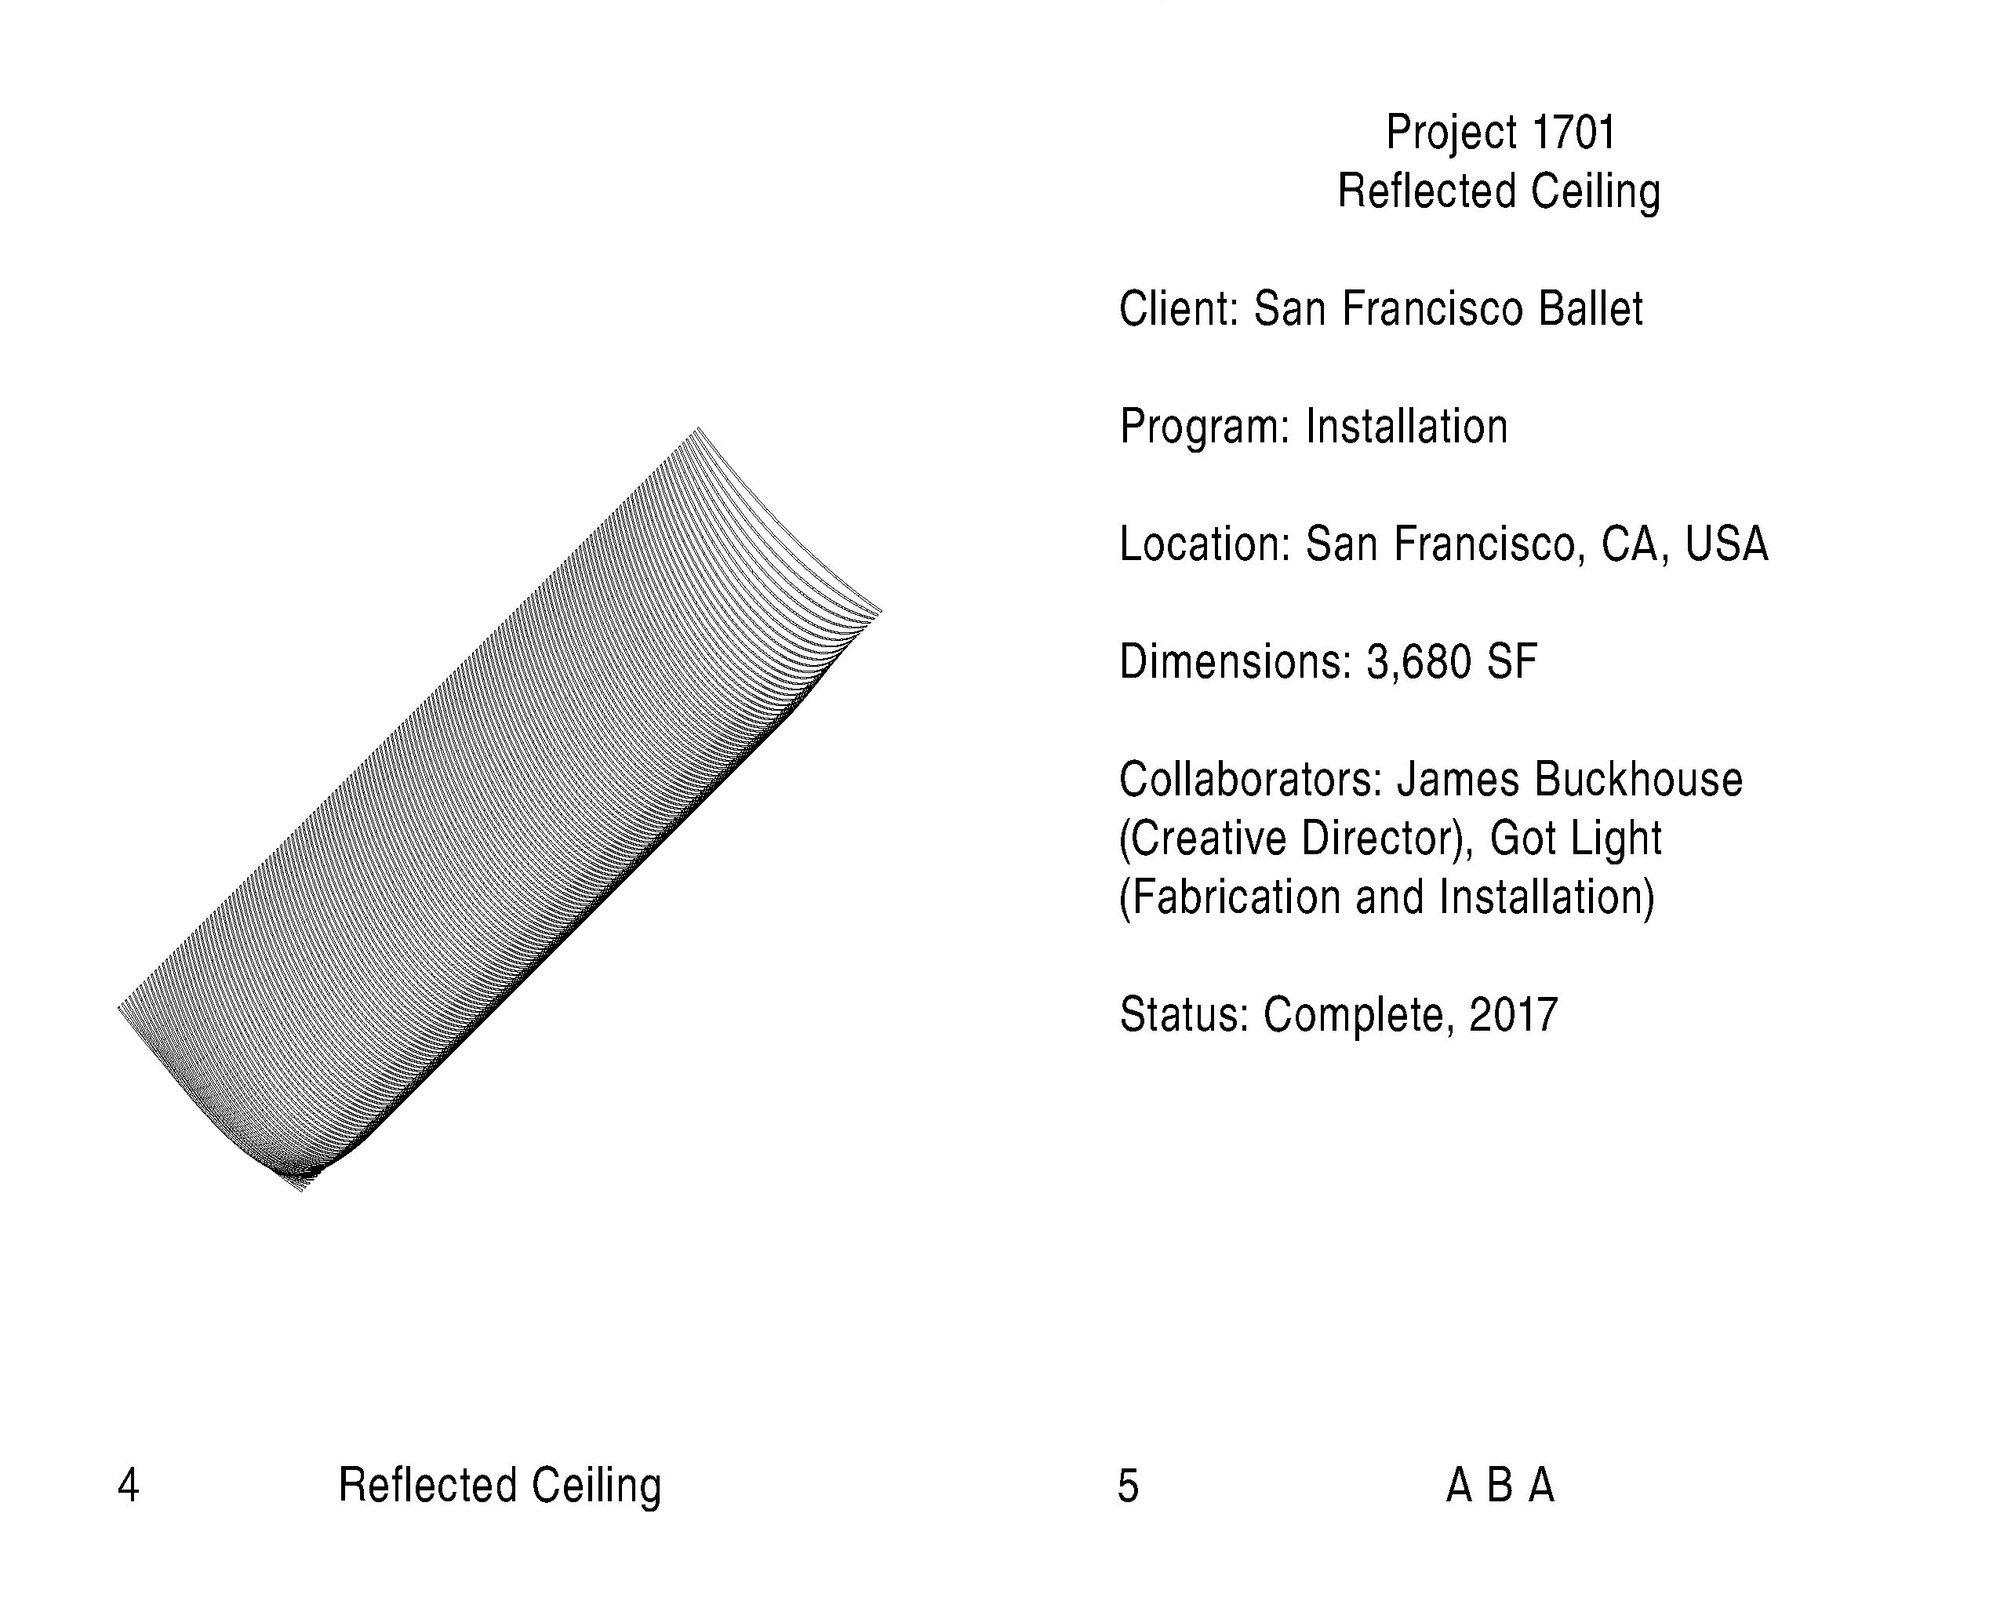 Abruzzo Bodziak Architects → Project: Reflected Ceiling → Booklet